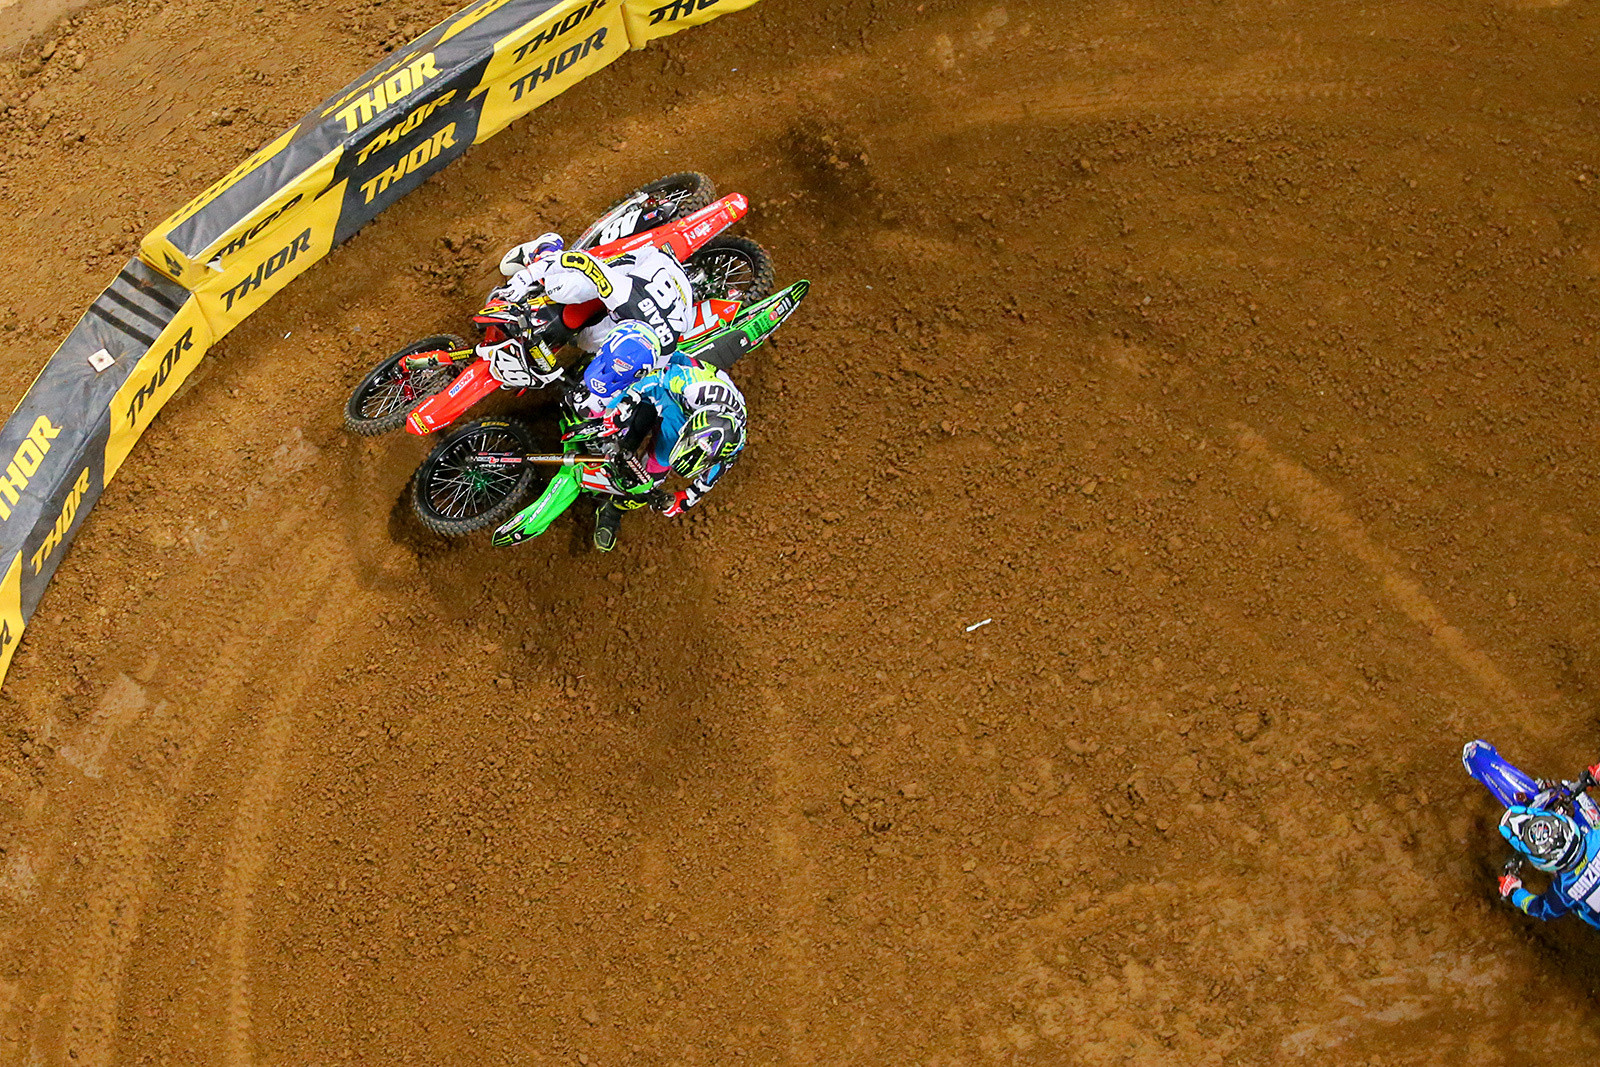 Christian Craig and Joey Savatgy - Photo Blast: St. Louis - Motocross Pictures - Vital MX